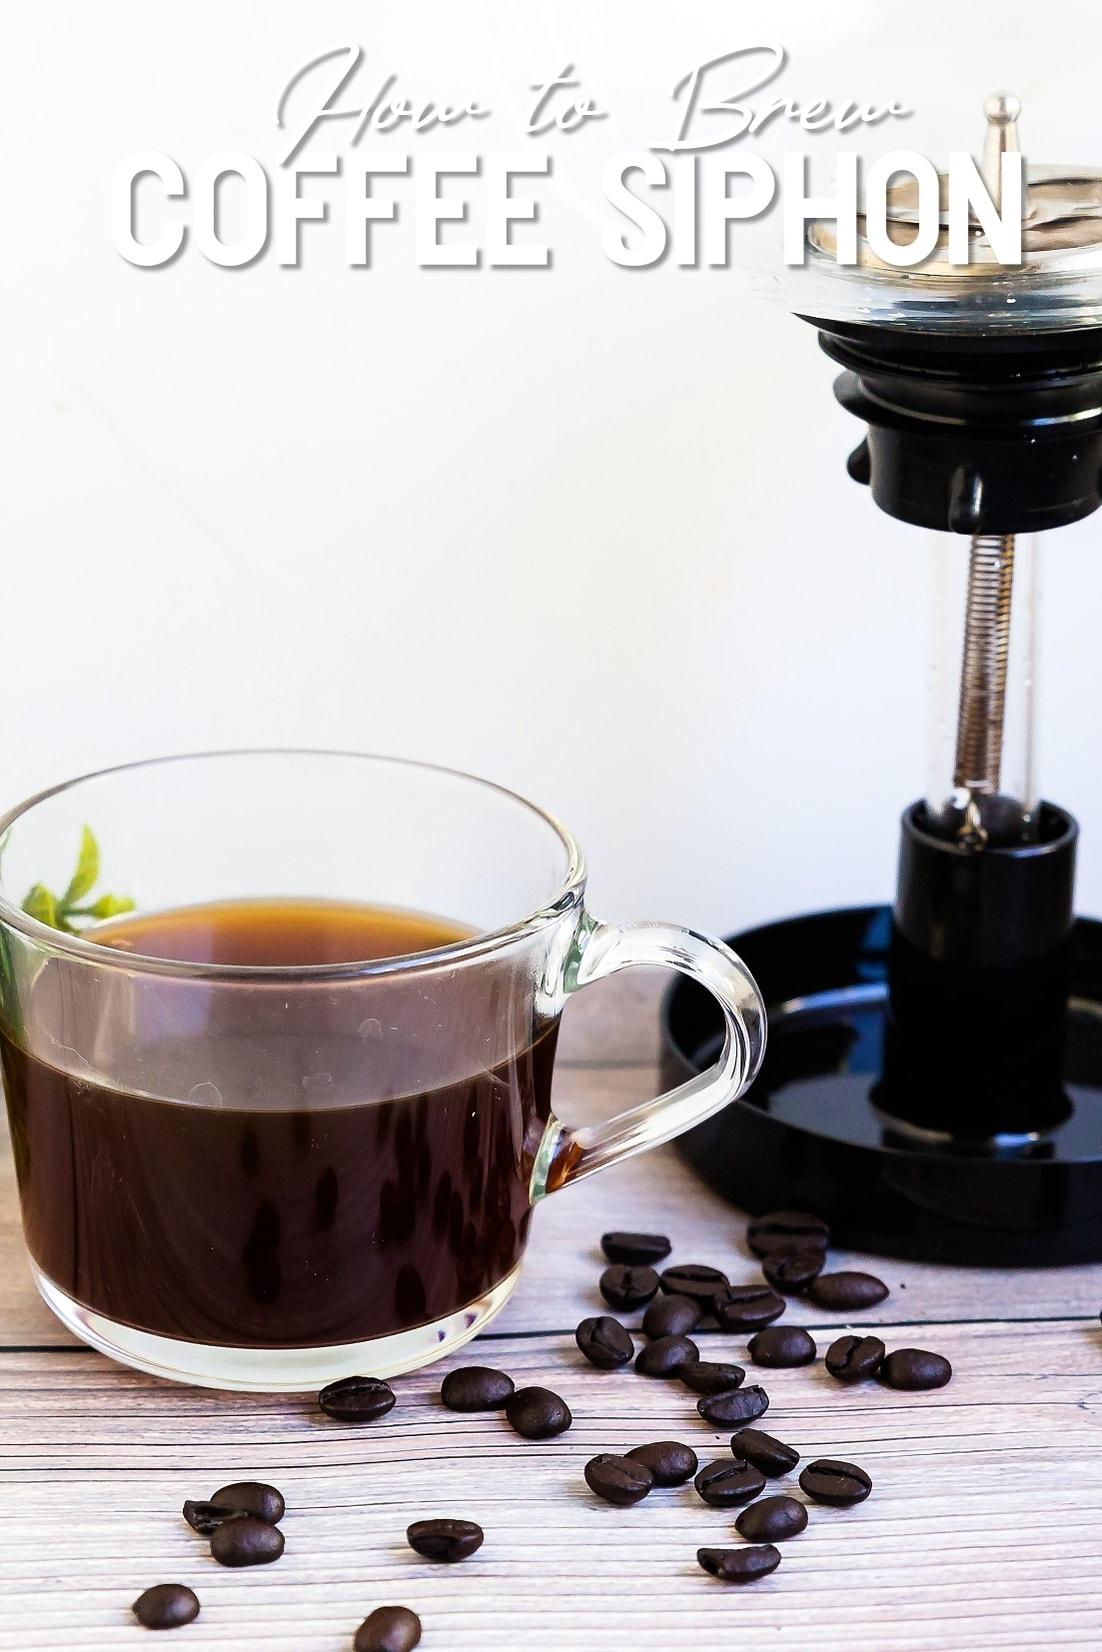 Coffee Siphon with a Mug